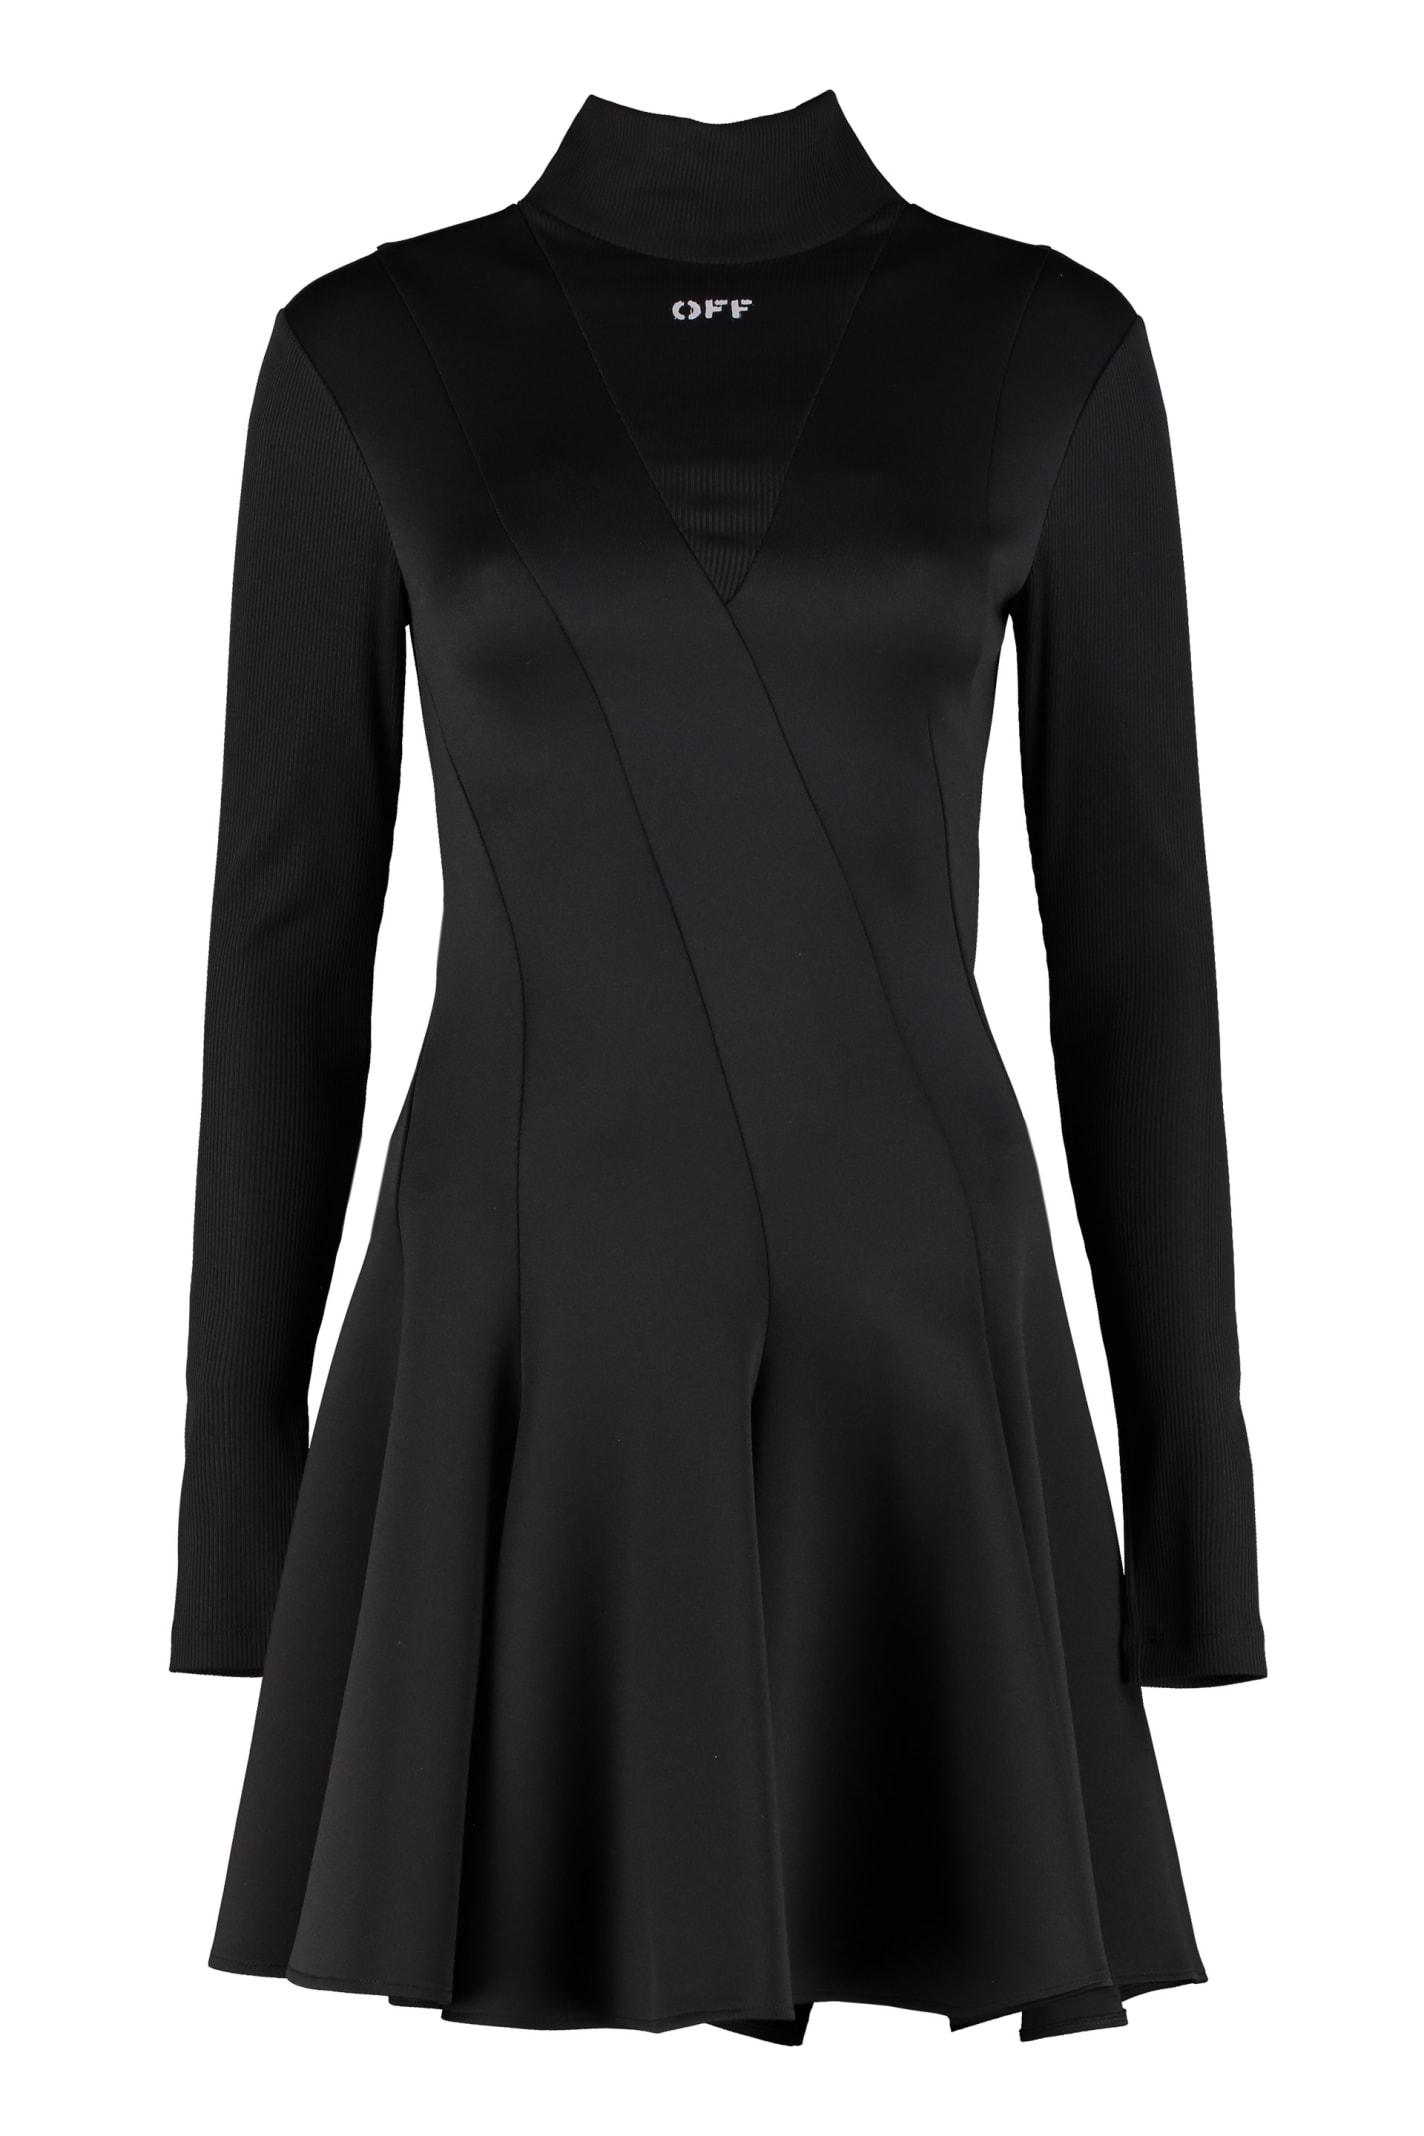 Off-White Technical Fabric Turtleneck Dress